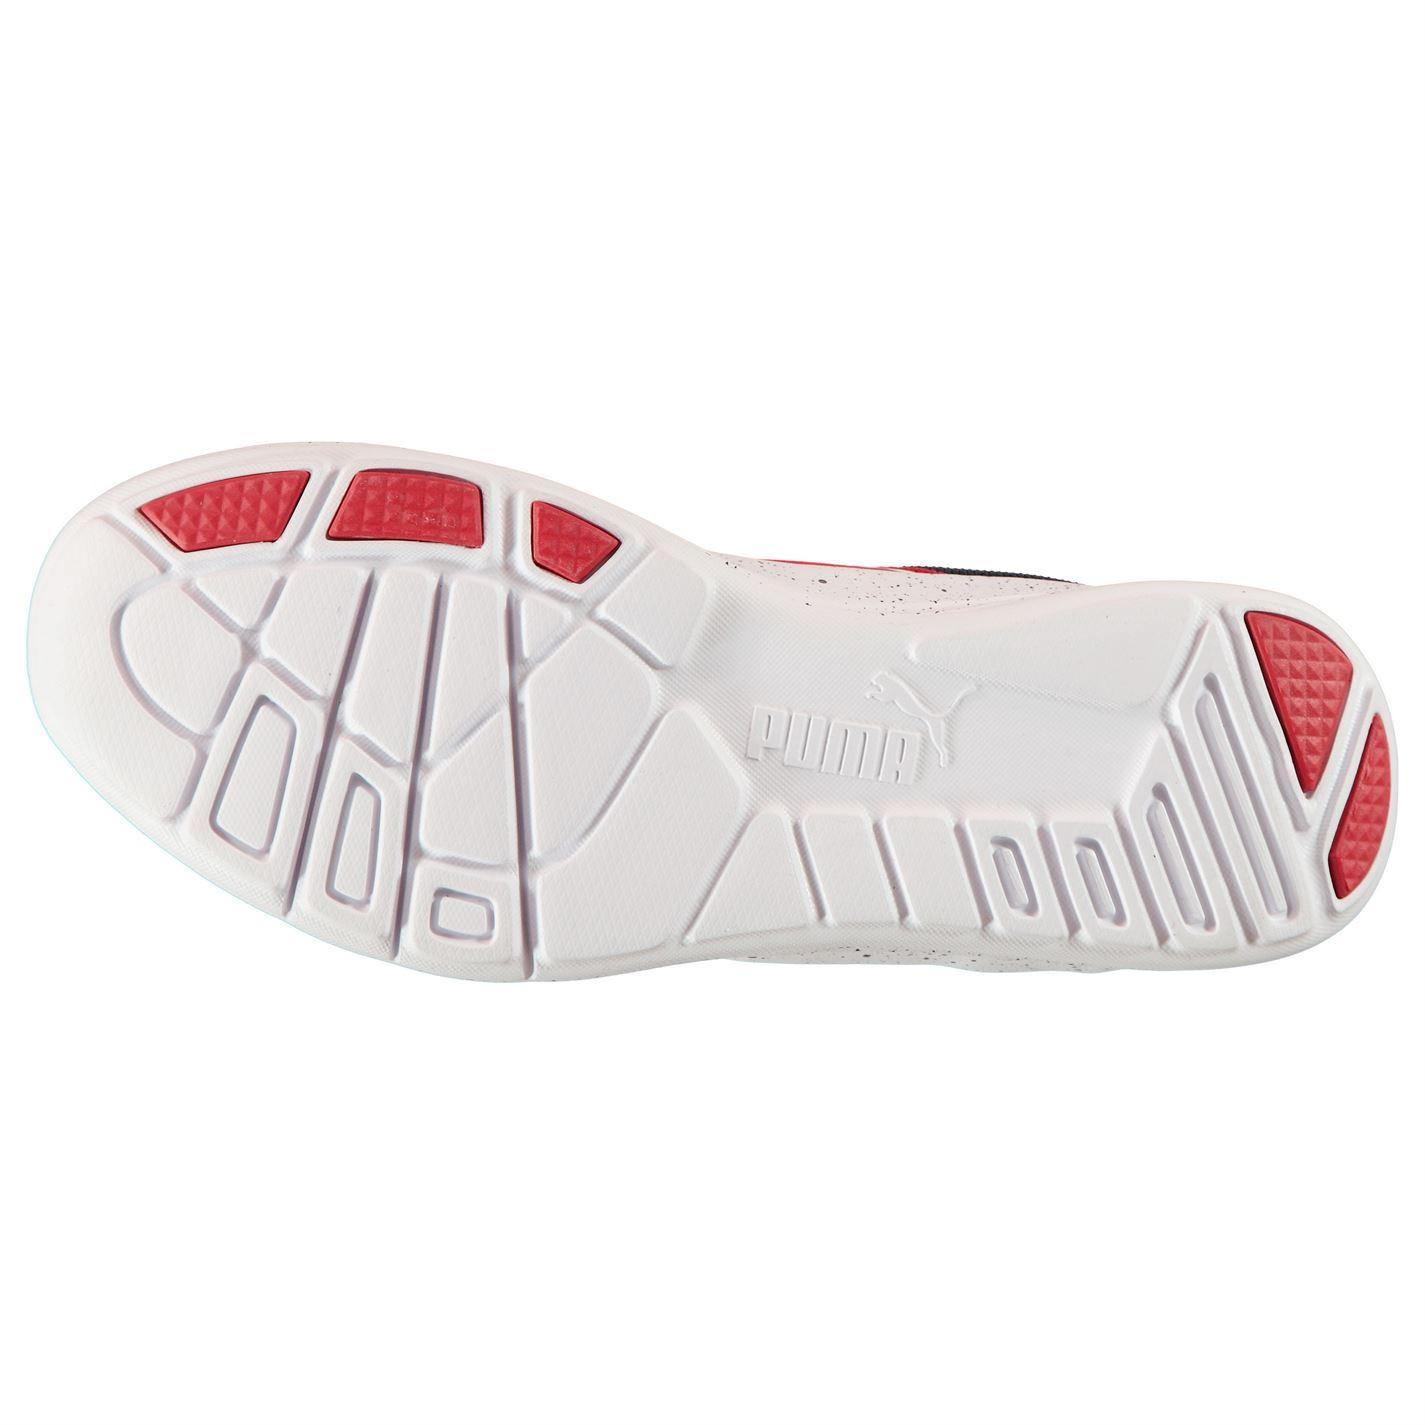 8b8cb2c0a91 ... Puma Red Bull Racing F1 Team Evo Trainers Mens Blue Athleisure Shoes  Sneakers ...